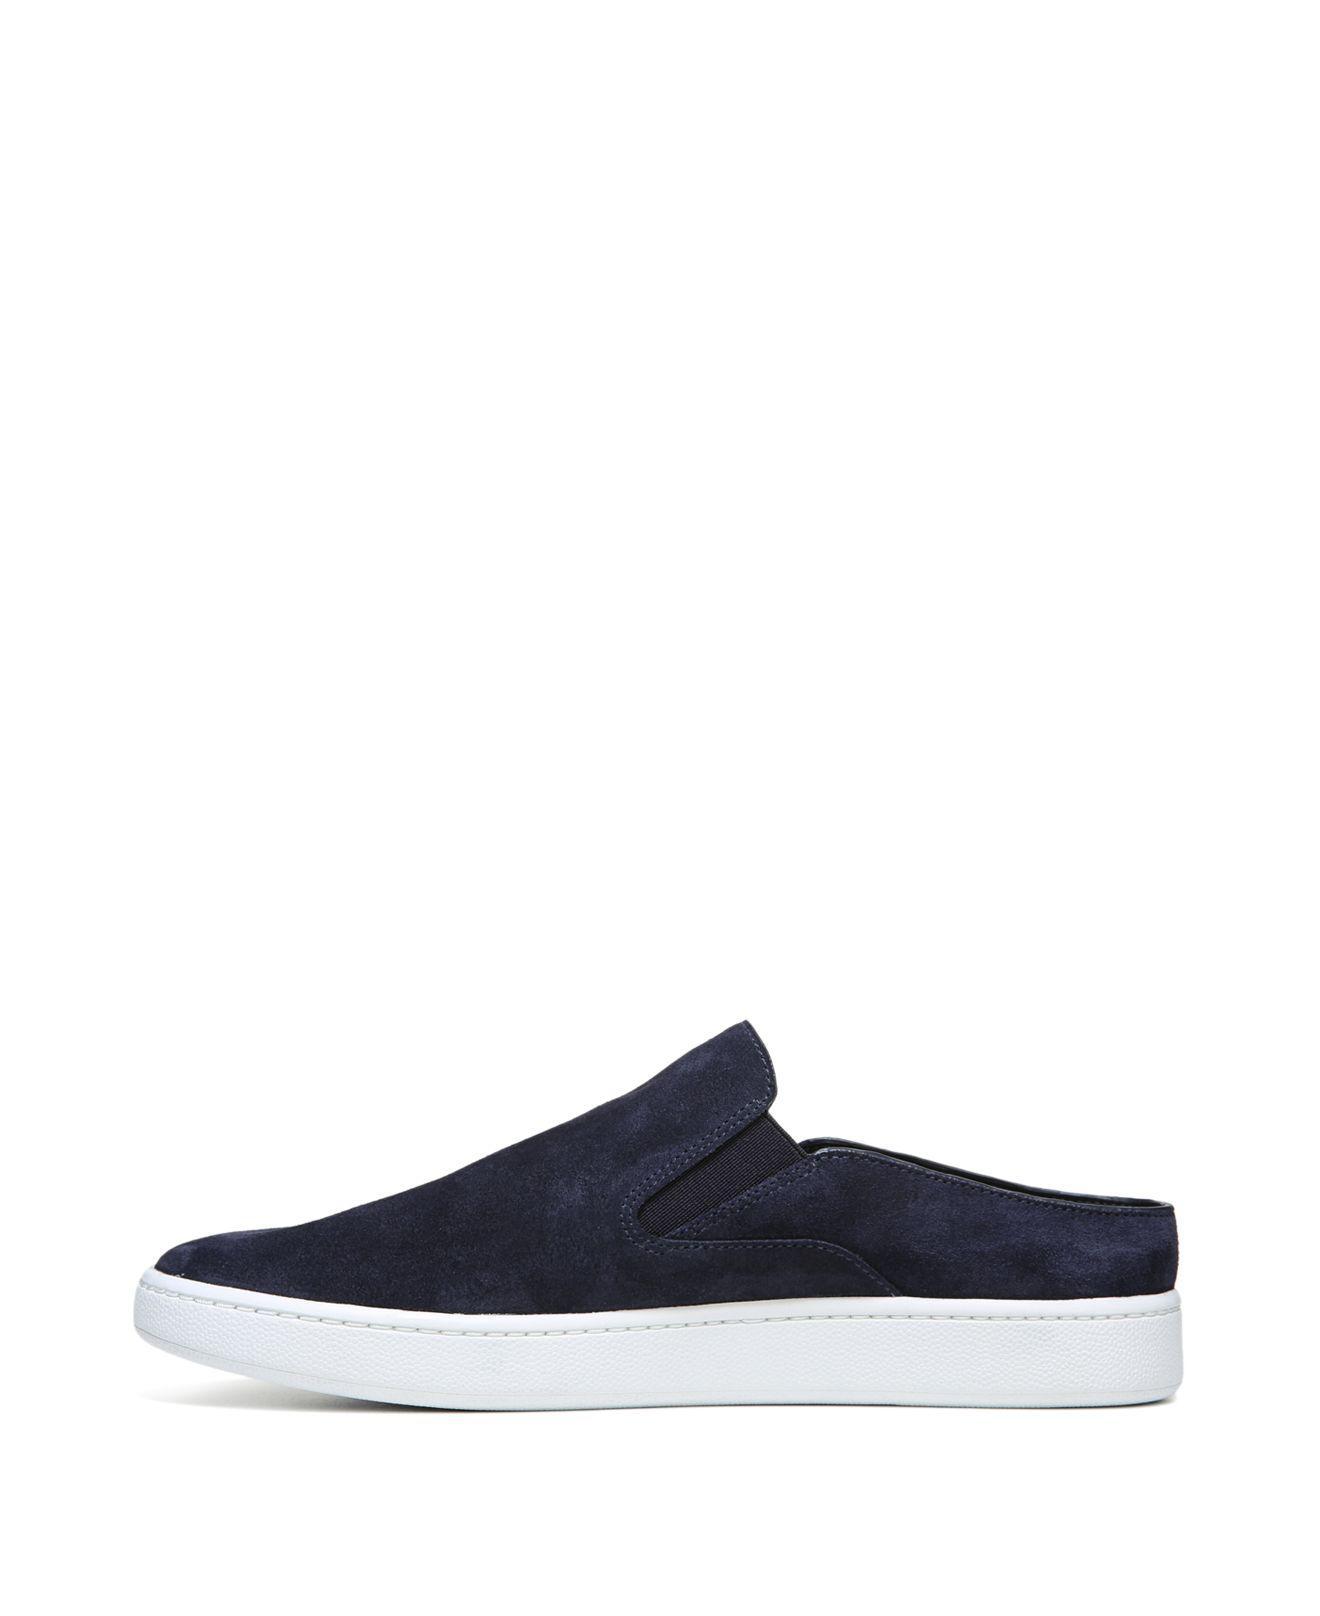 Vince Verrell Suede Slip-on Sneakers in Deep Blue (Blue)